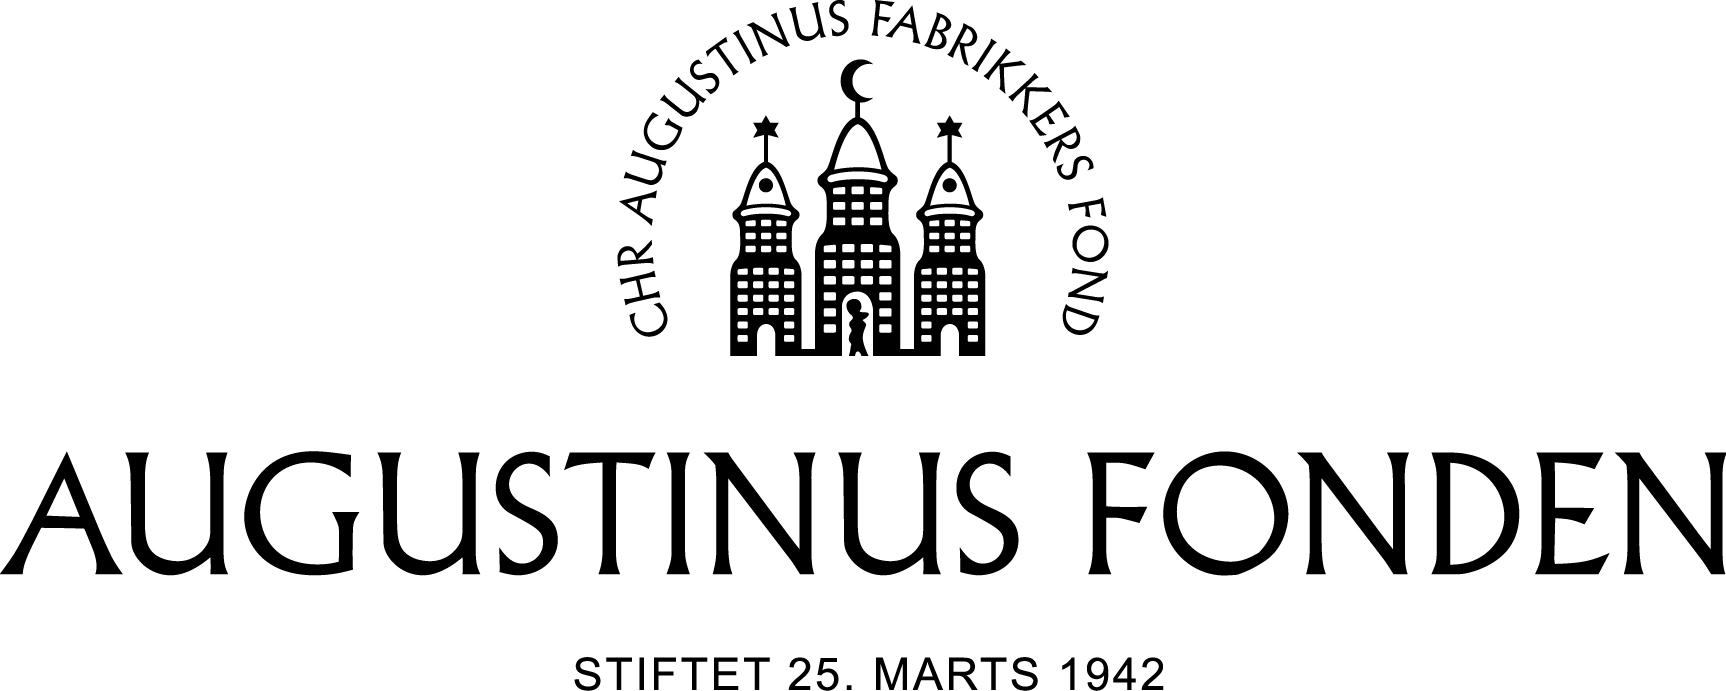 Augustinus_Fonden_logo_FINAL - Kopi.jpg